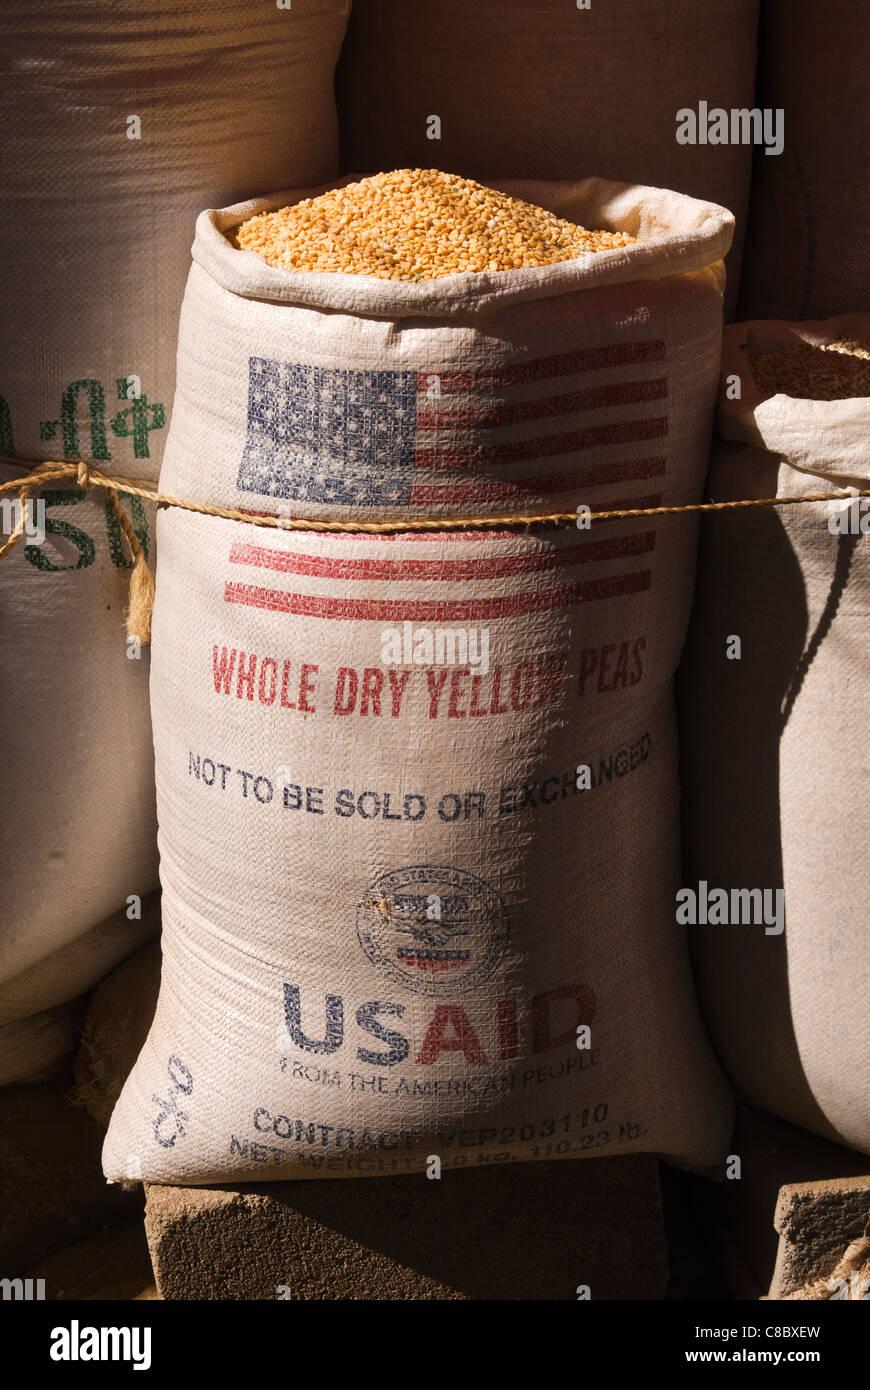 Elk200-4136v Ethiopia, Harar, market, yellow lentils - Stock Image